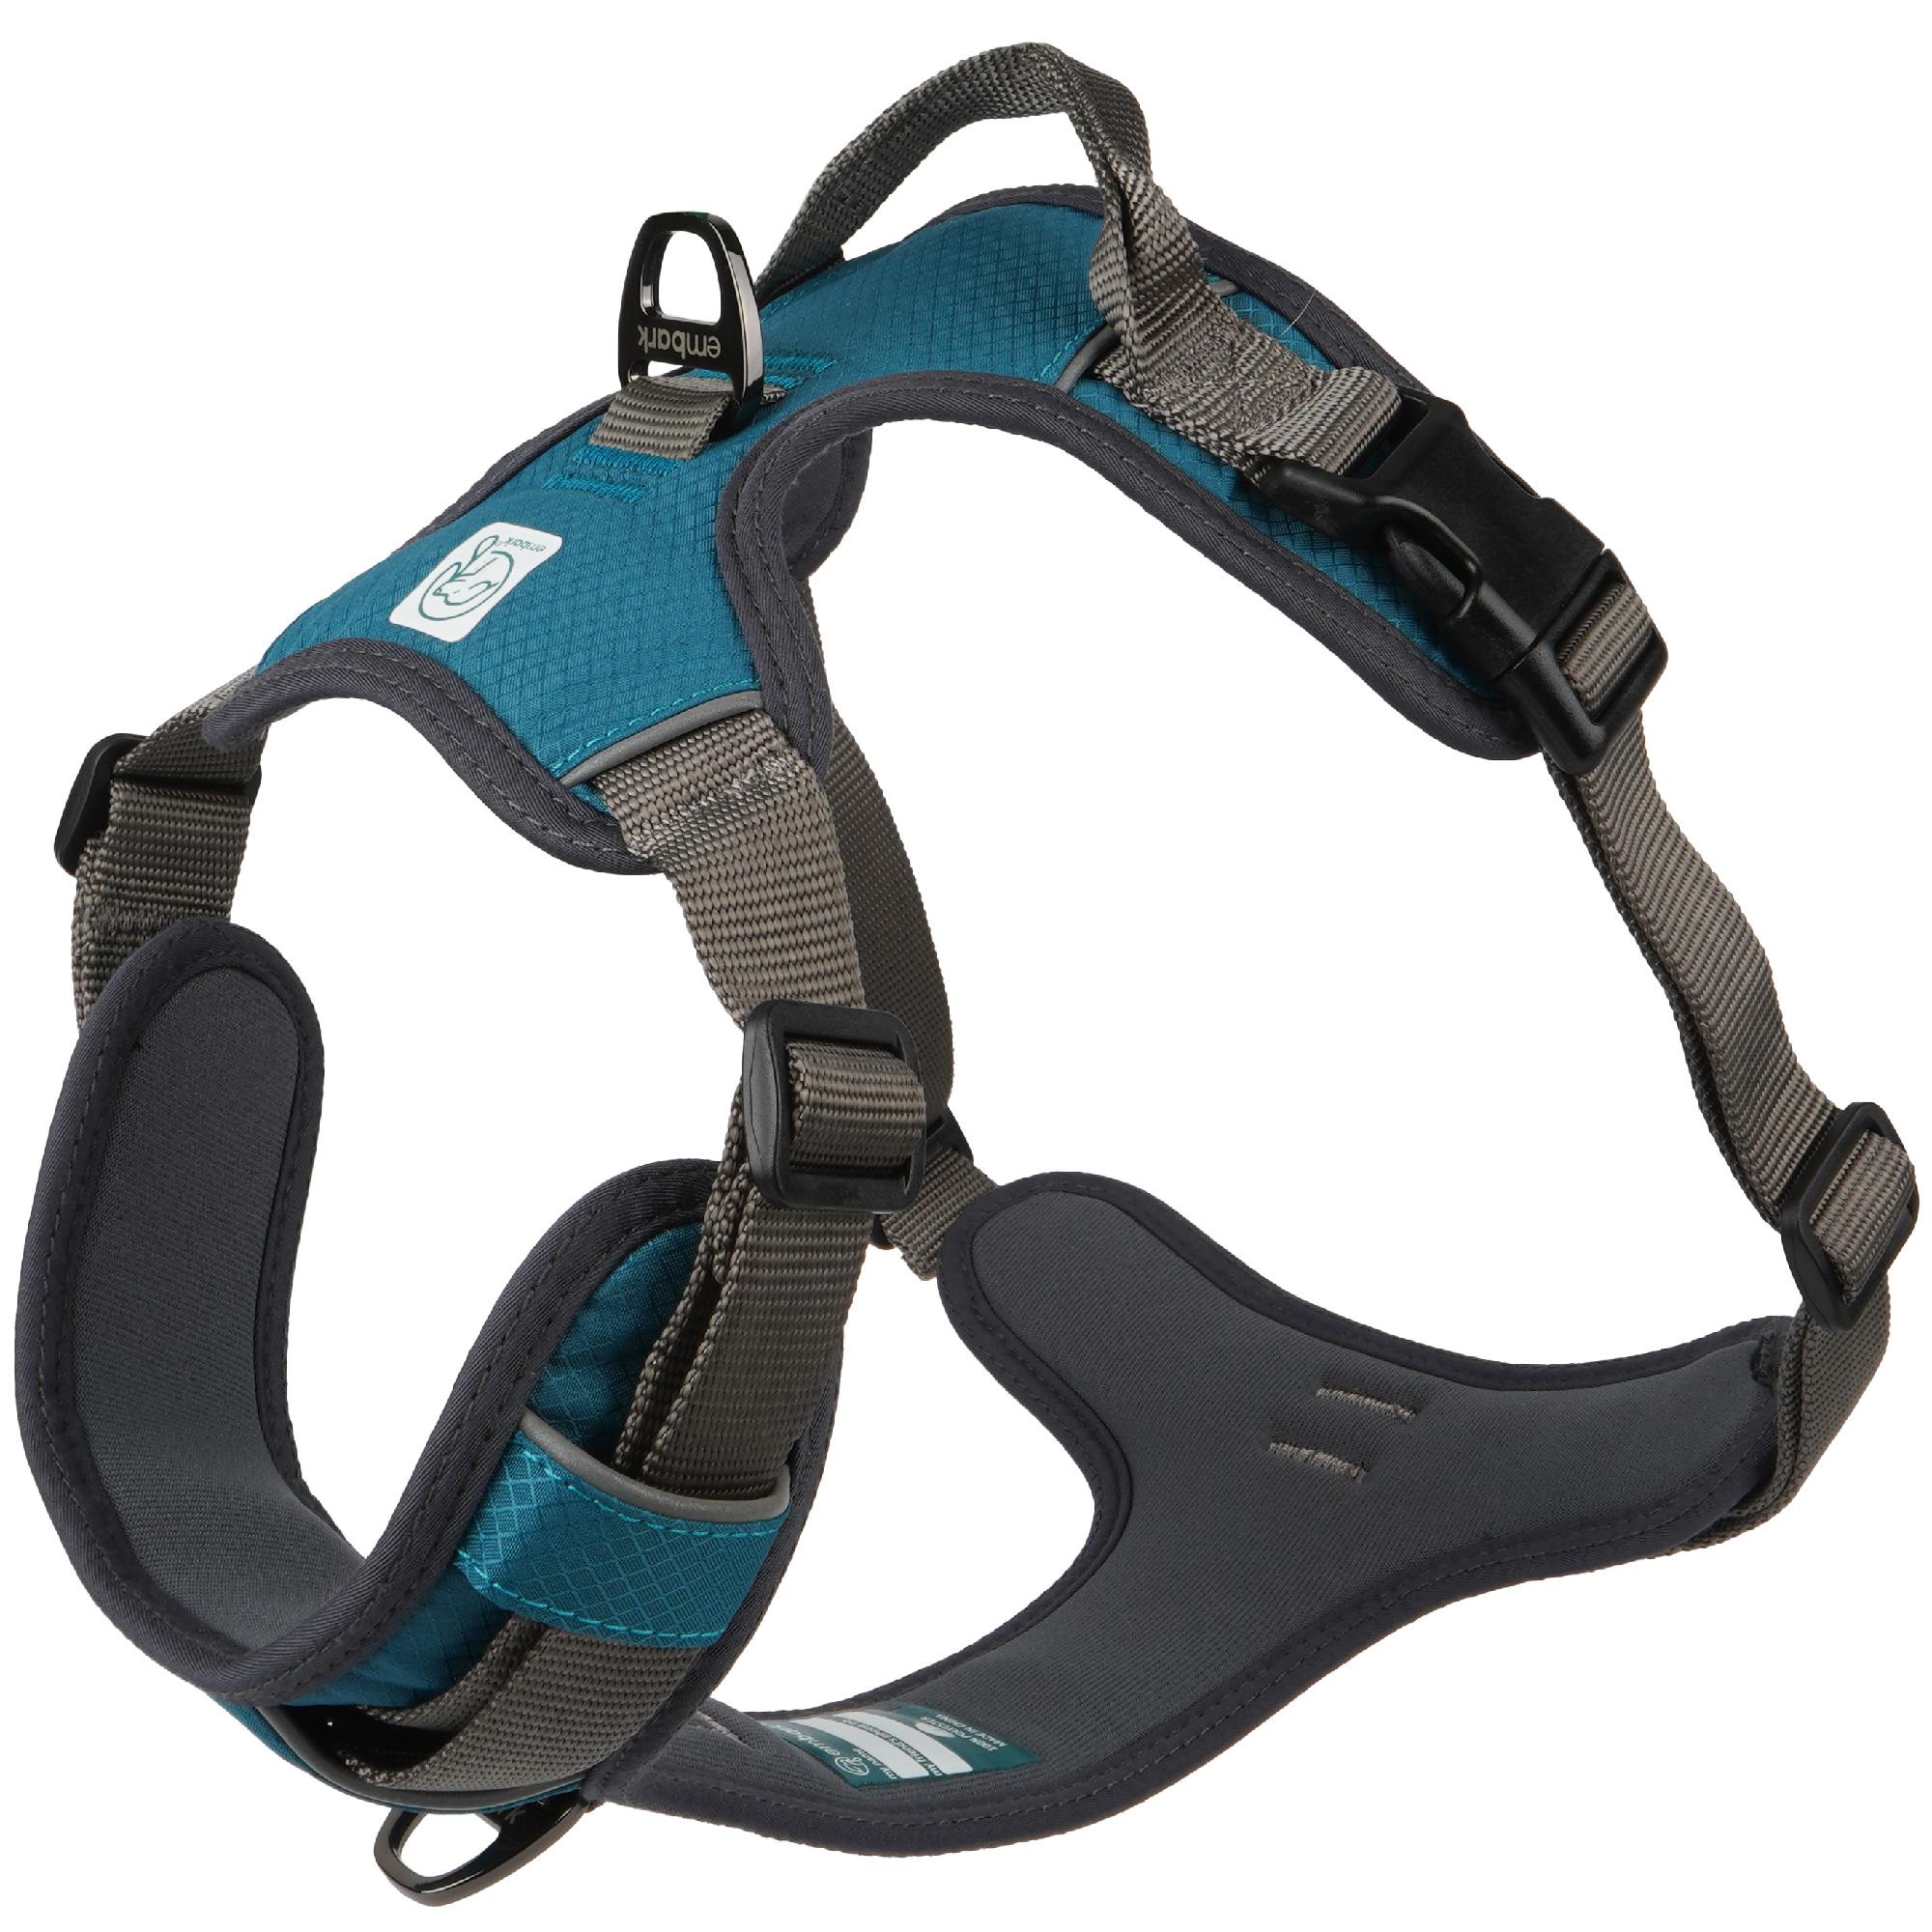 Neato Creative Embark harness